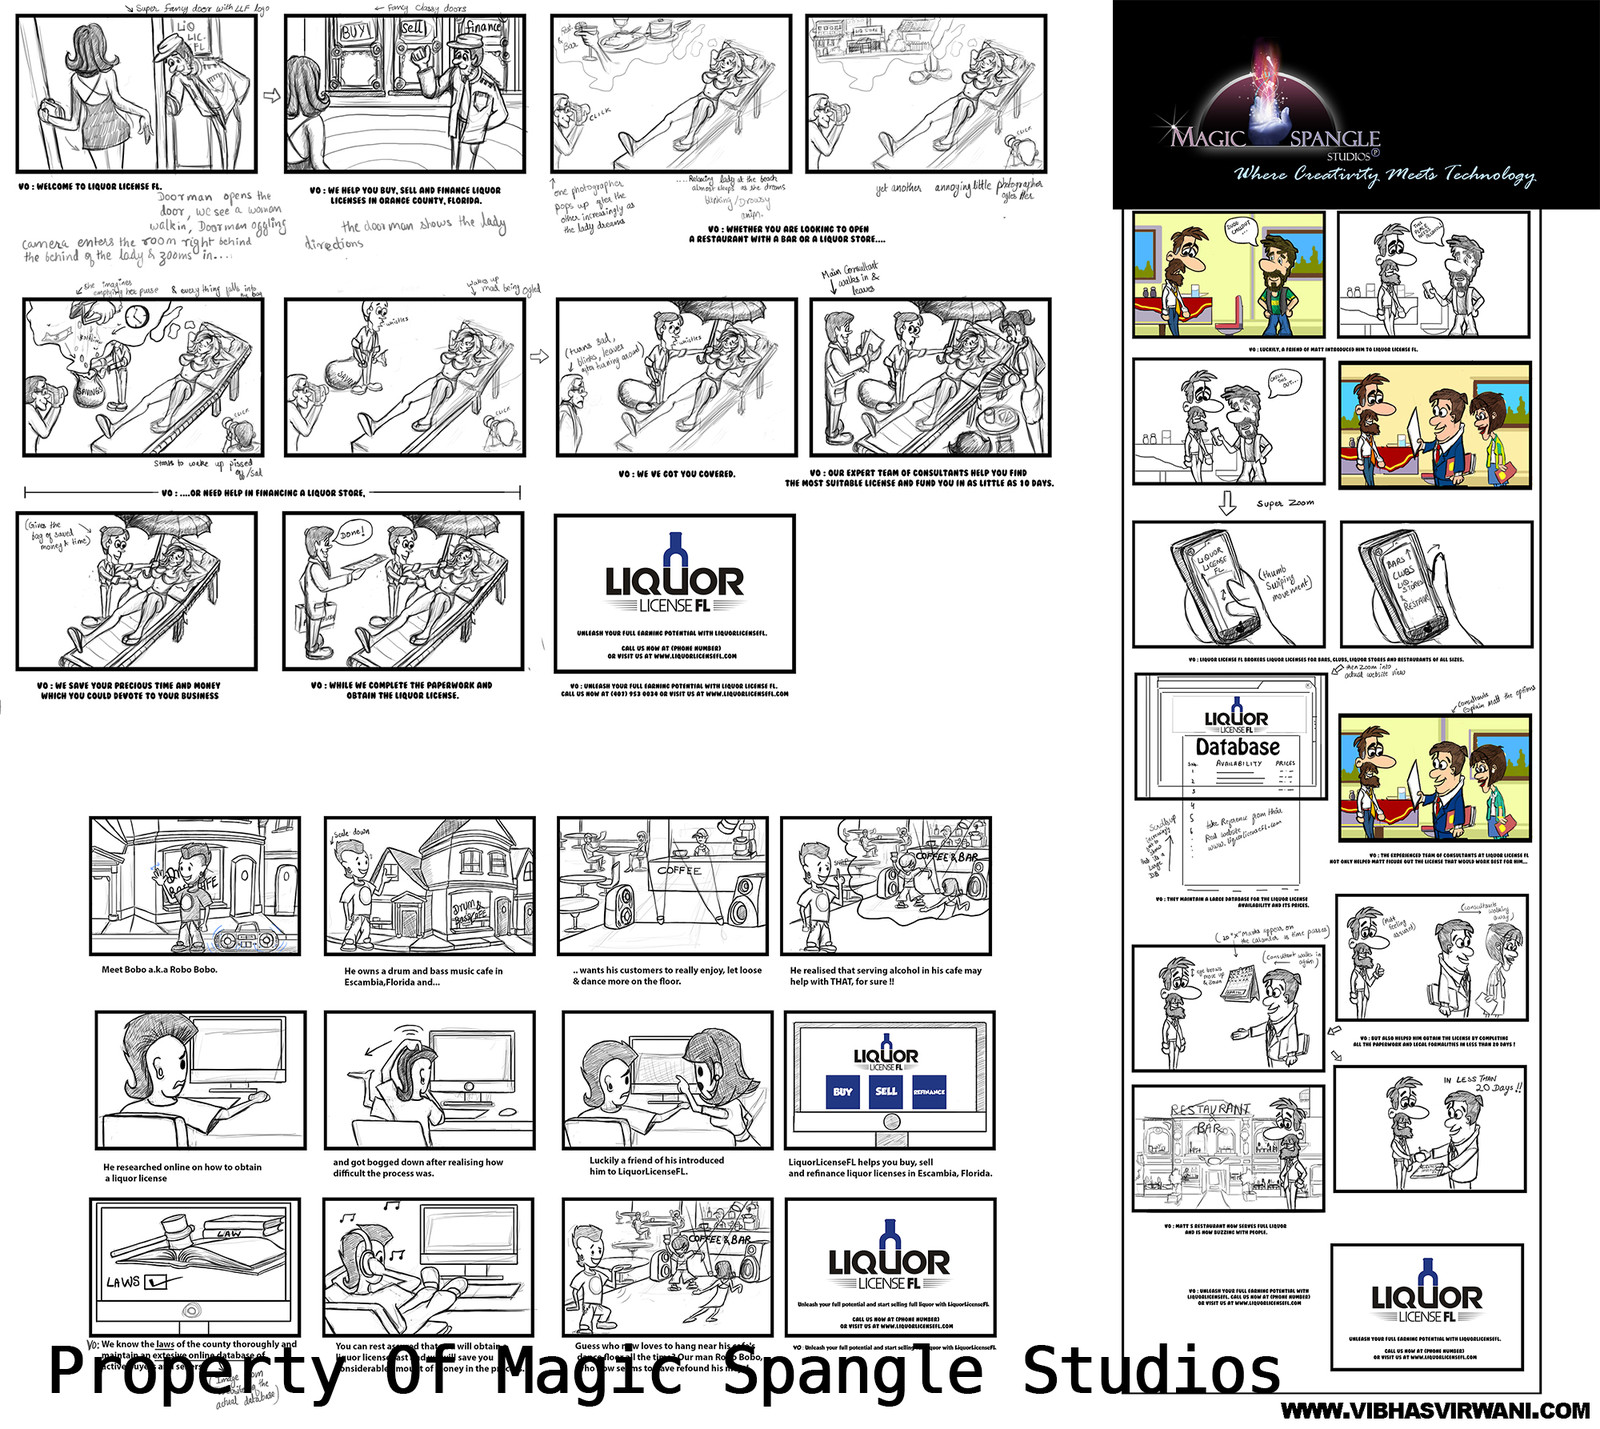 3 Liquor license florida storyboards